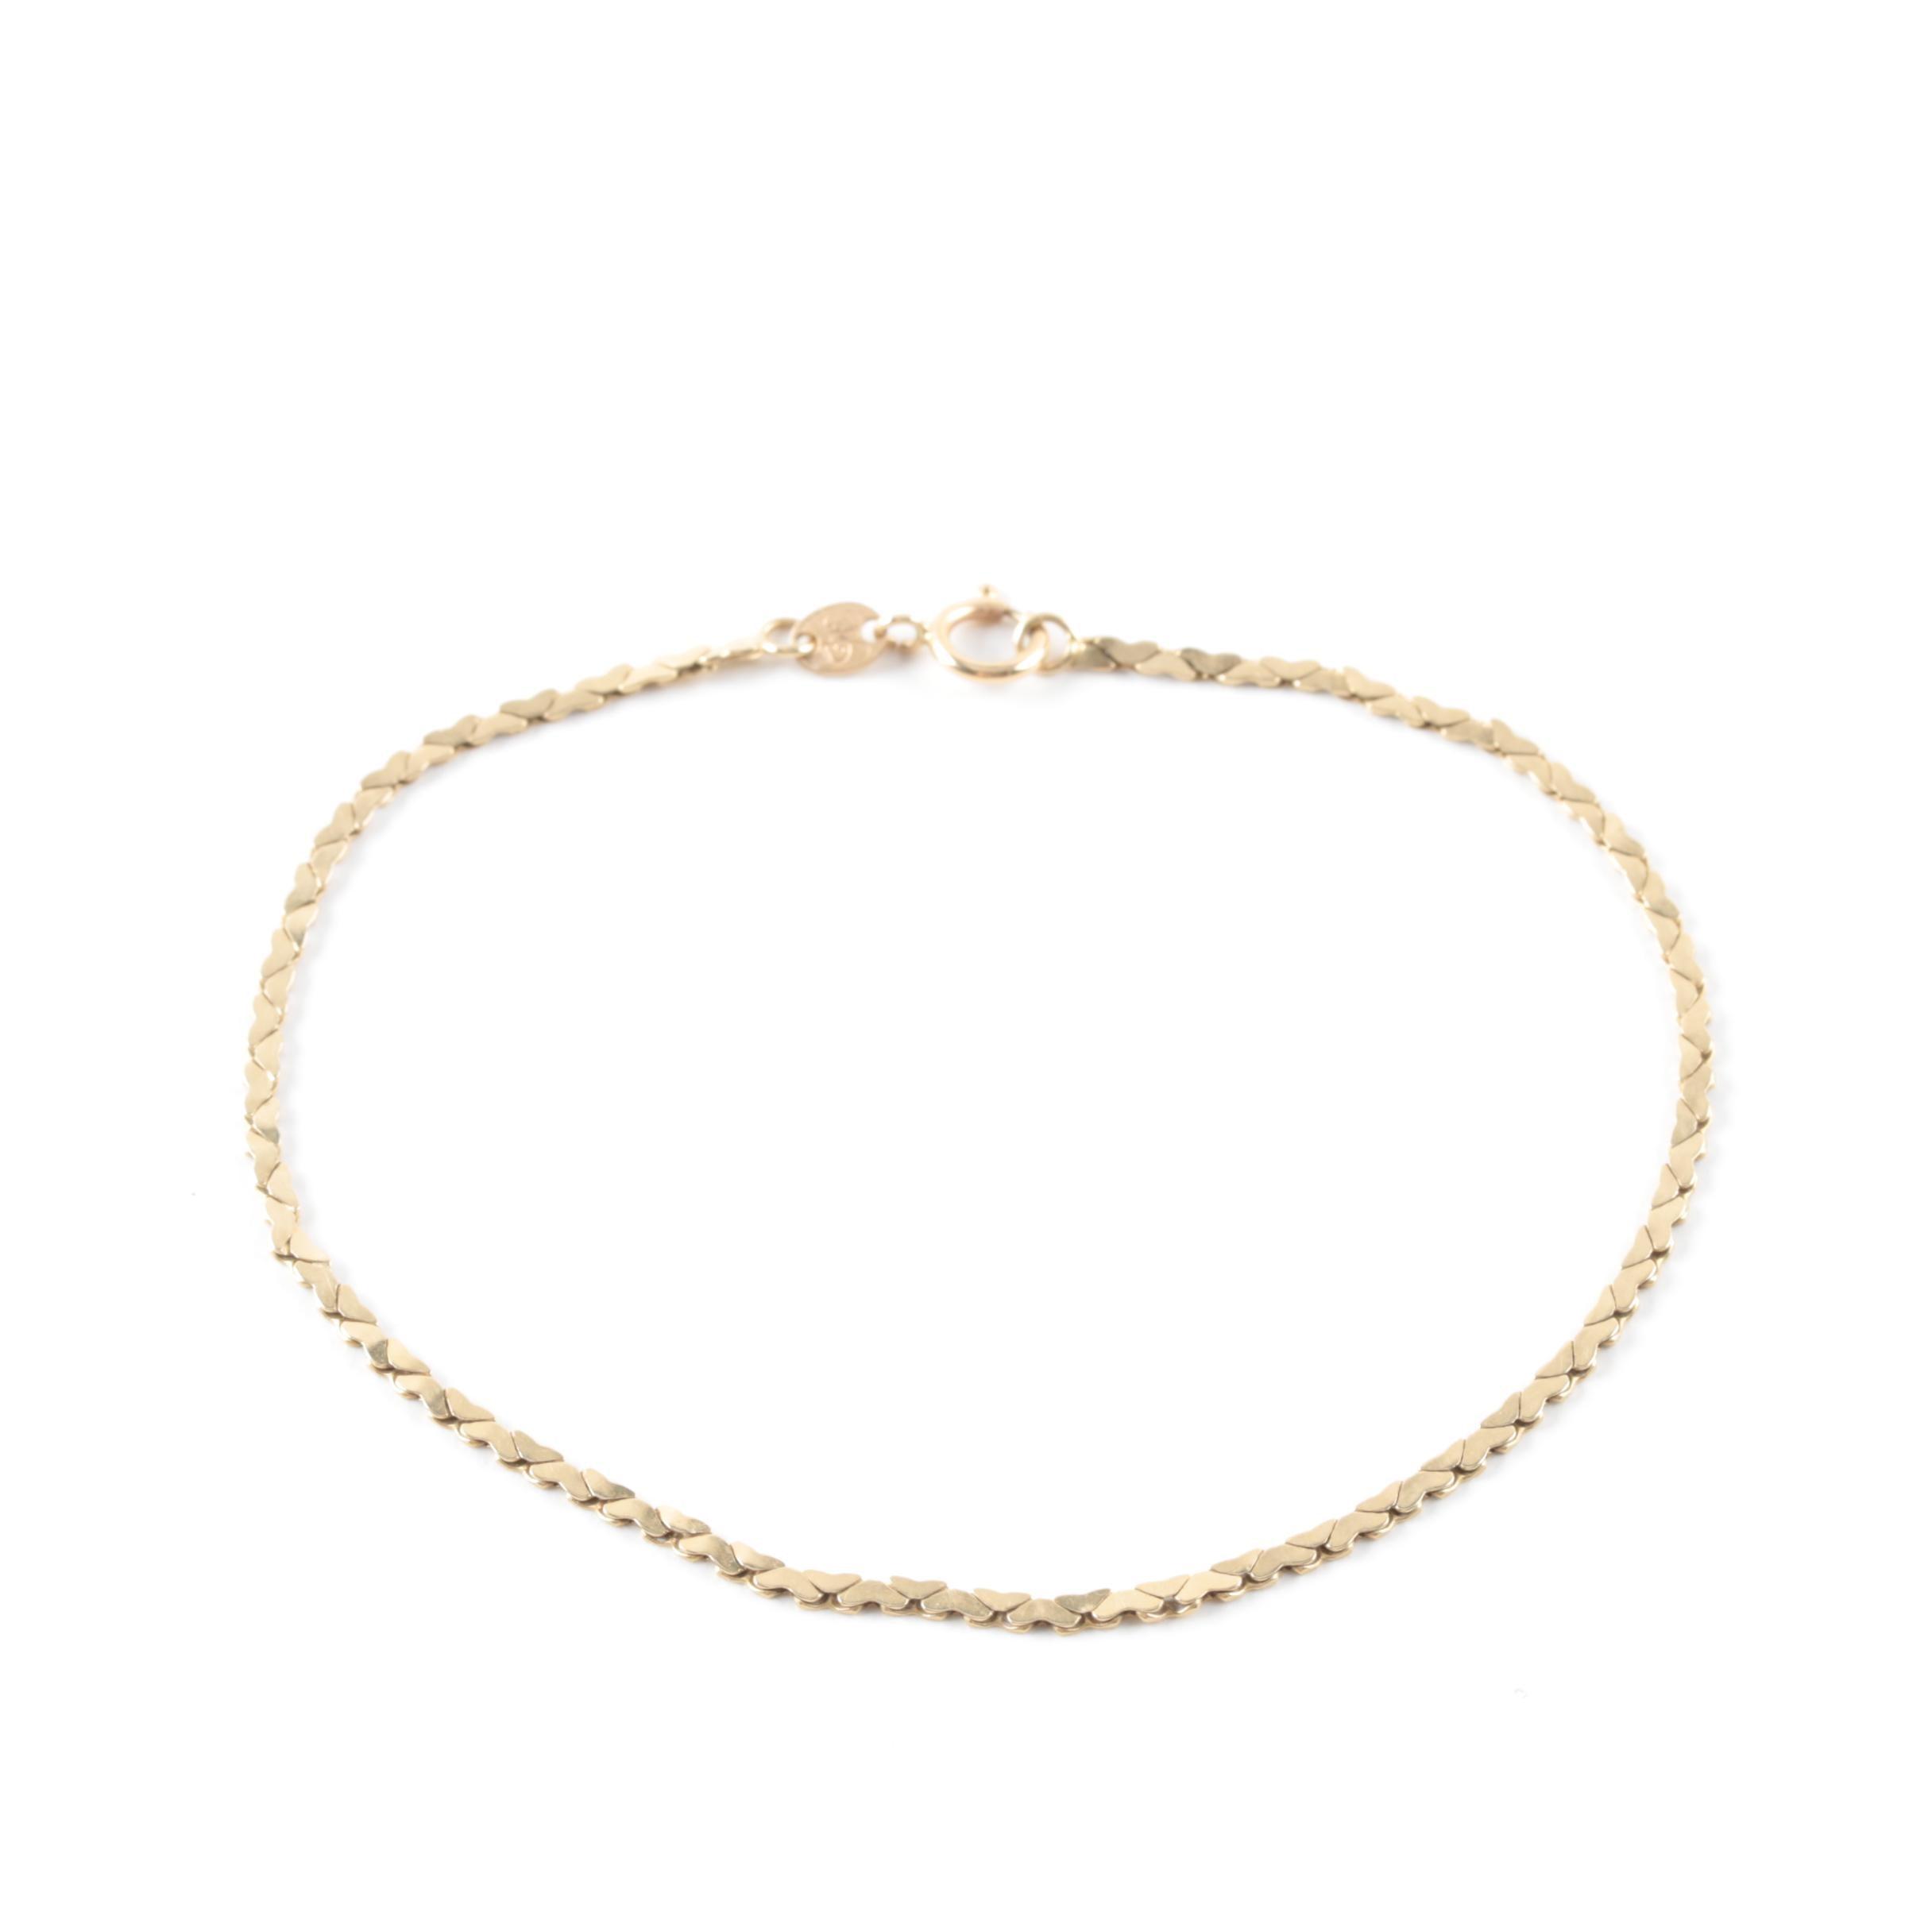 14K Yellow Gold Cobra Chain Bracelet